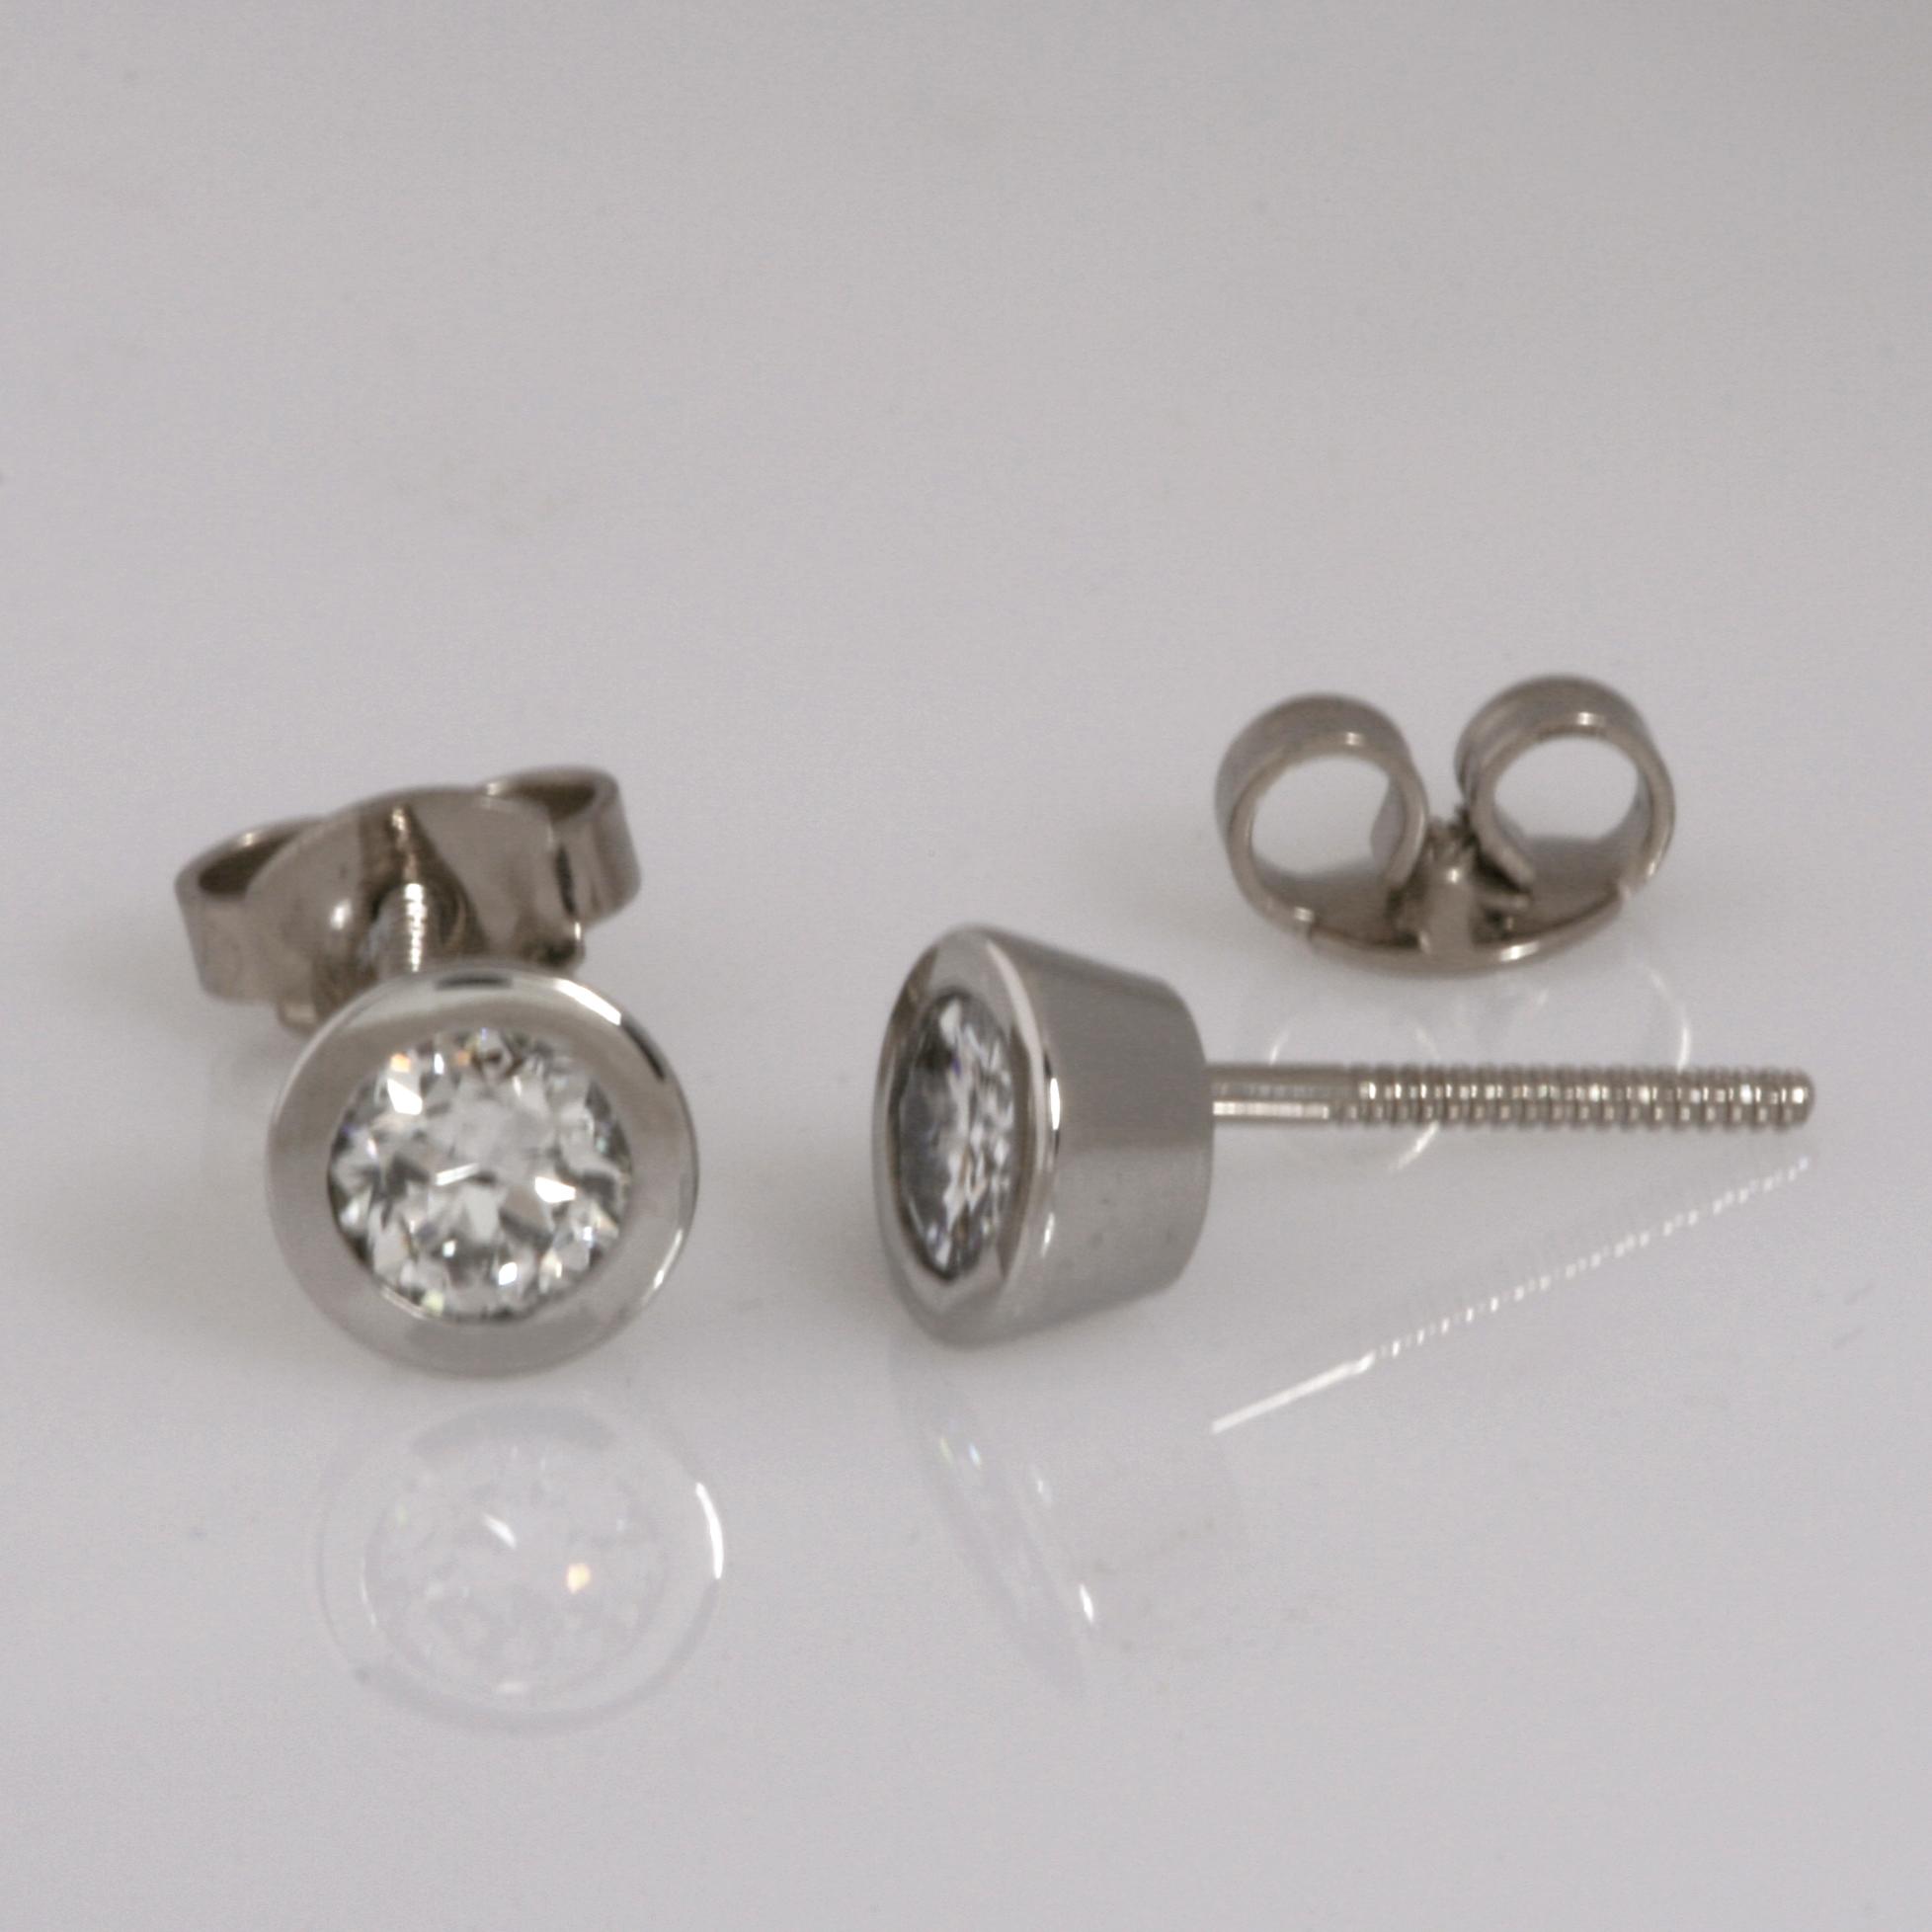 Handmade ladies palladium and 18ct white gold brilliant cut diamond earrings